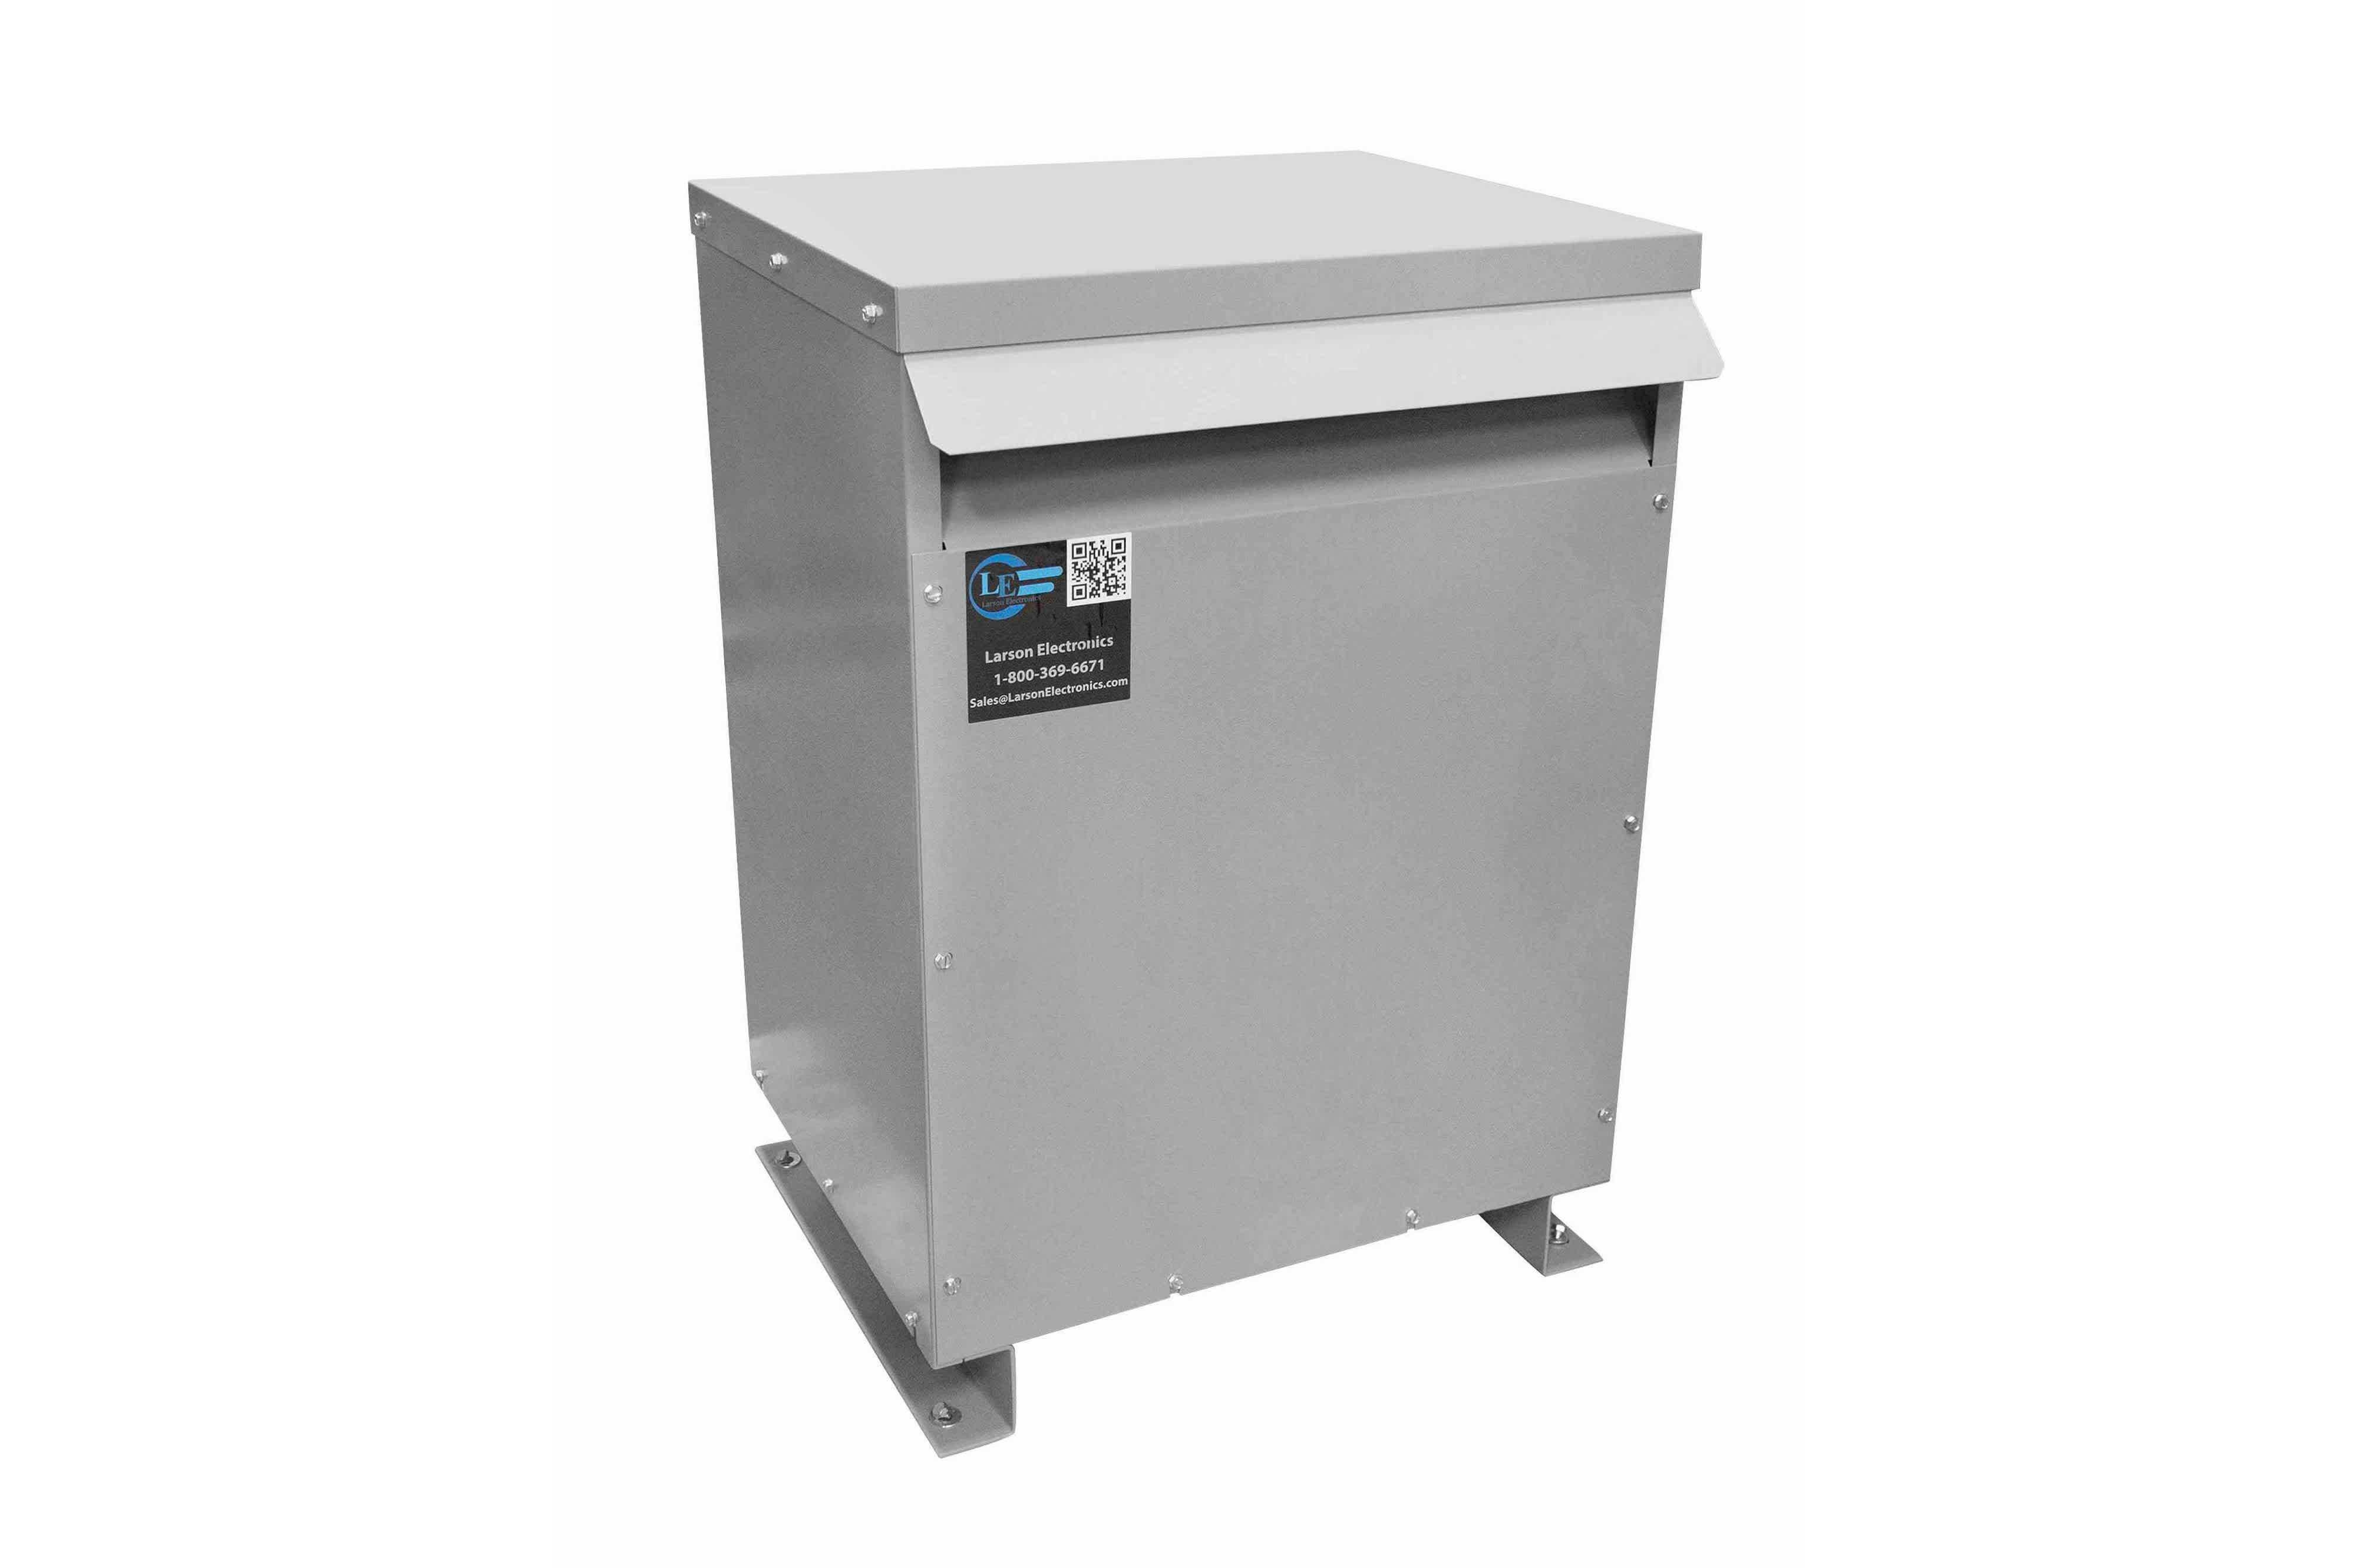 30 kVA 3PH Isolation Transformer, 440V Wye Primary, 240V Delta Secondary, N3R, Ventilated, 60 Hz